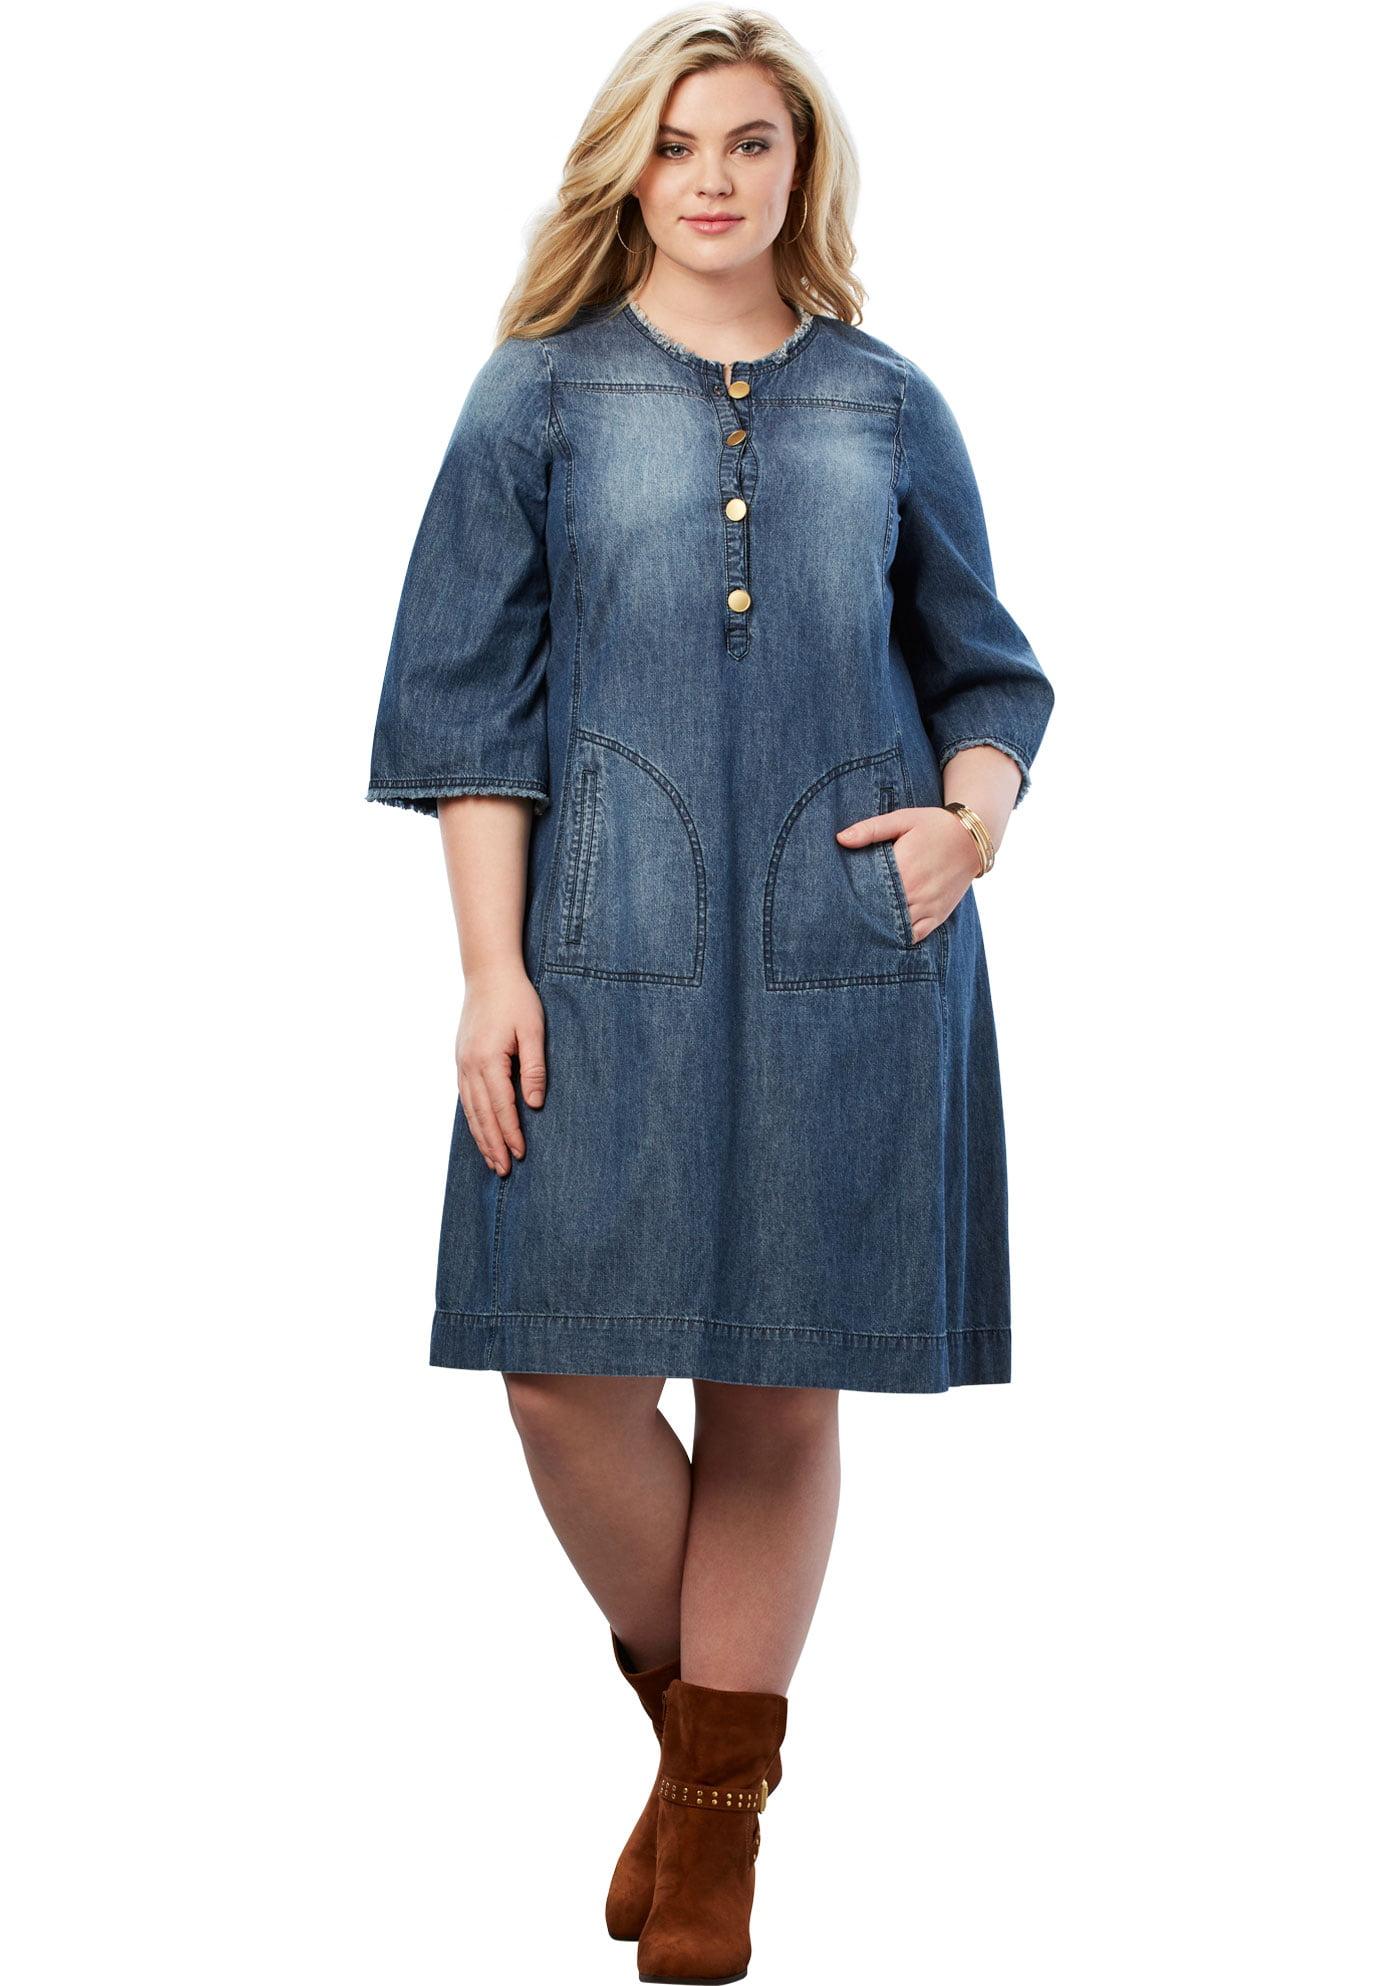 Roaman\'s - Roaman\'s Plus Size Denim Shirt Dress - Walmart.com